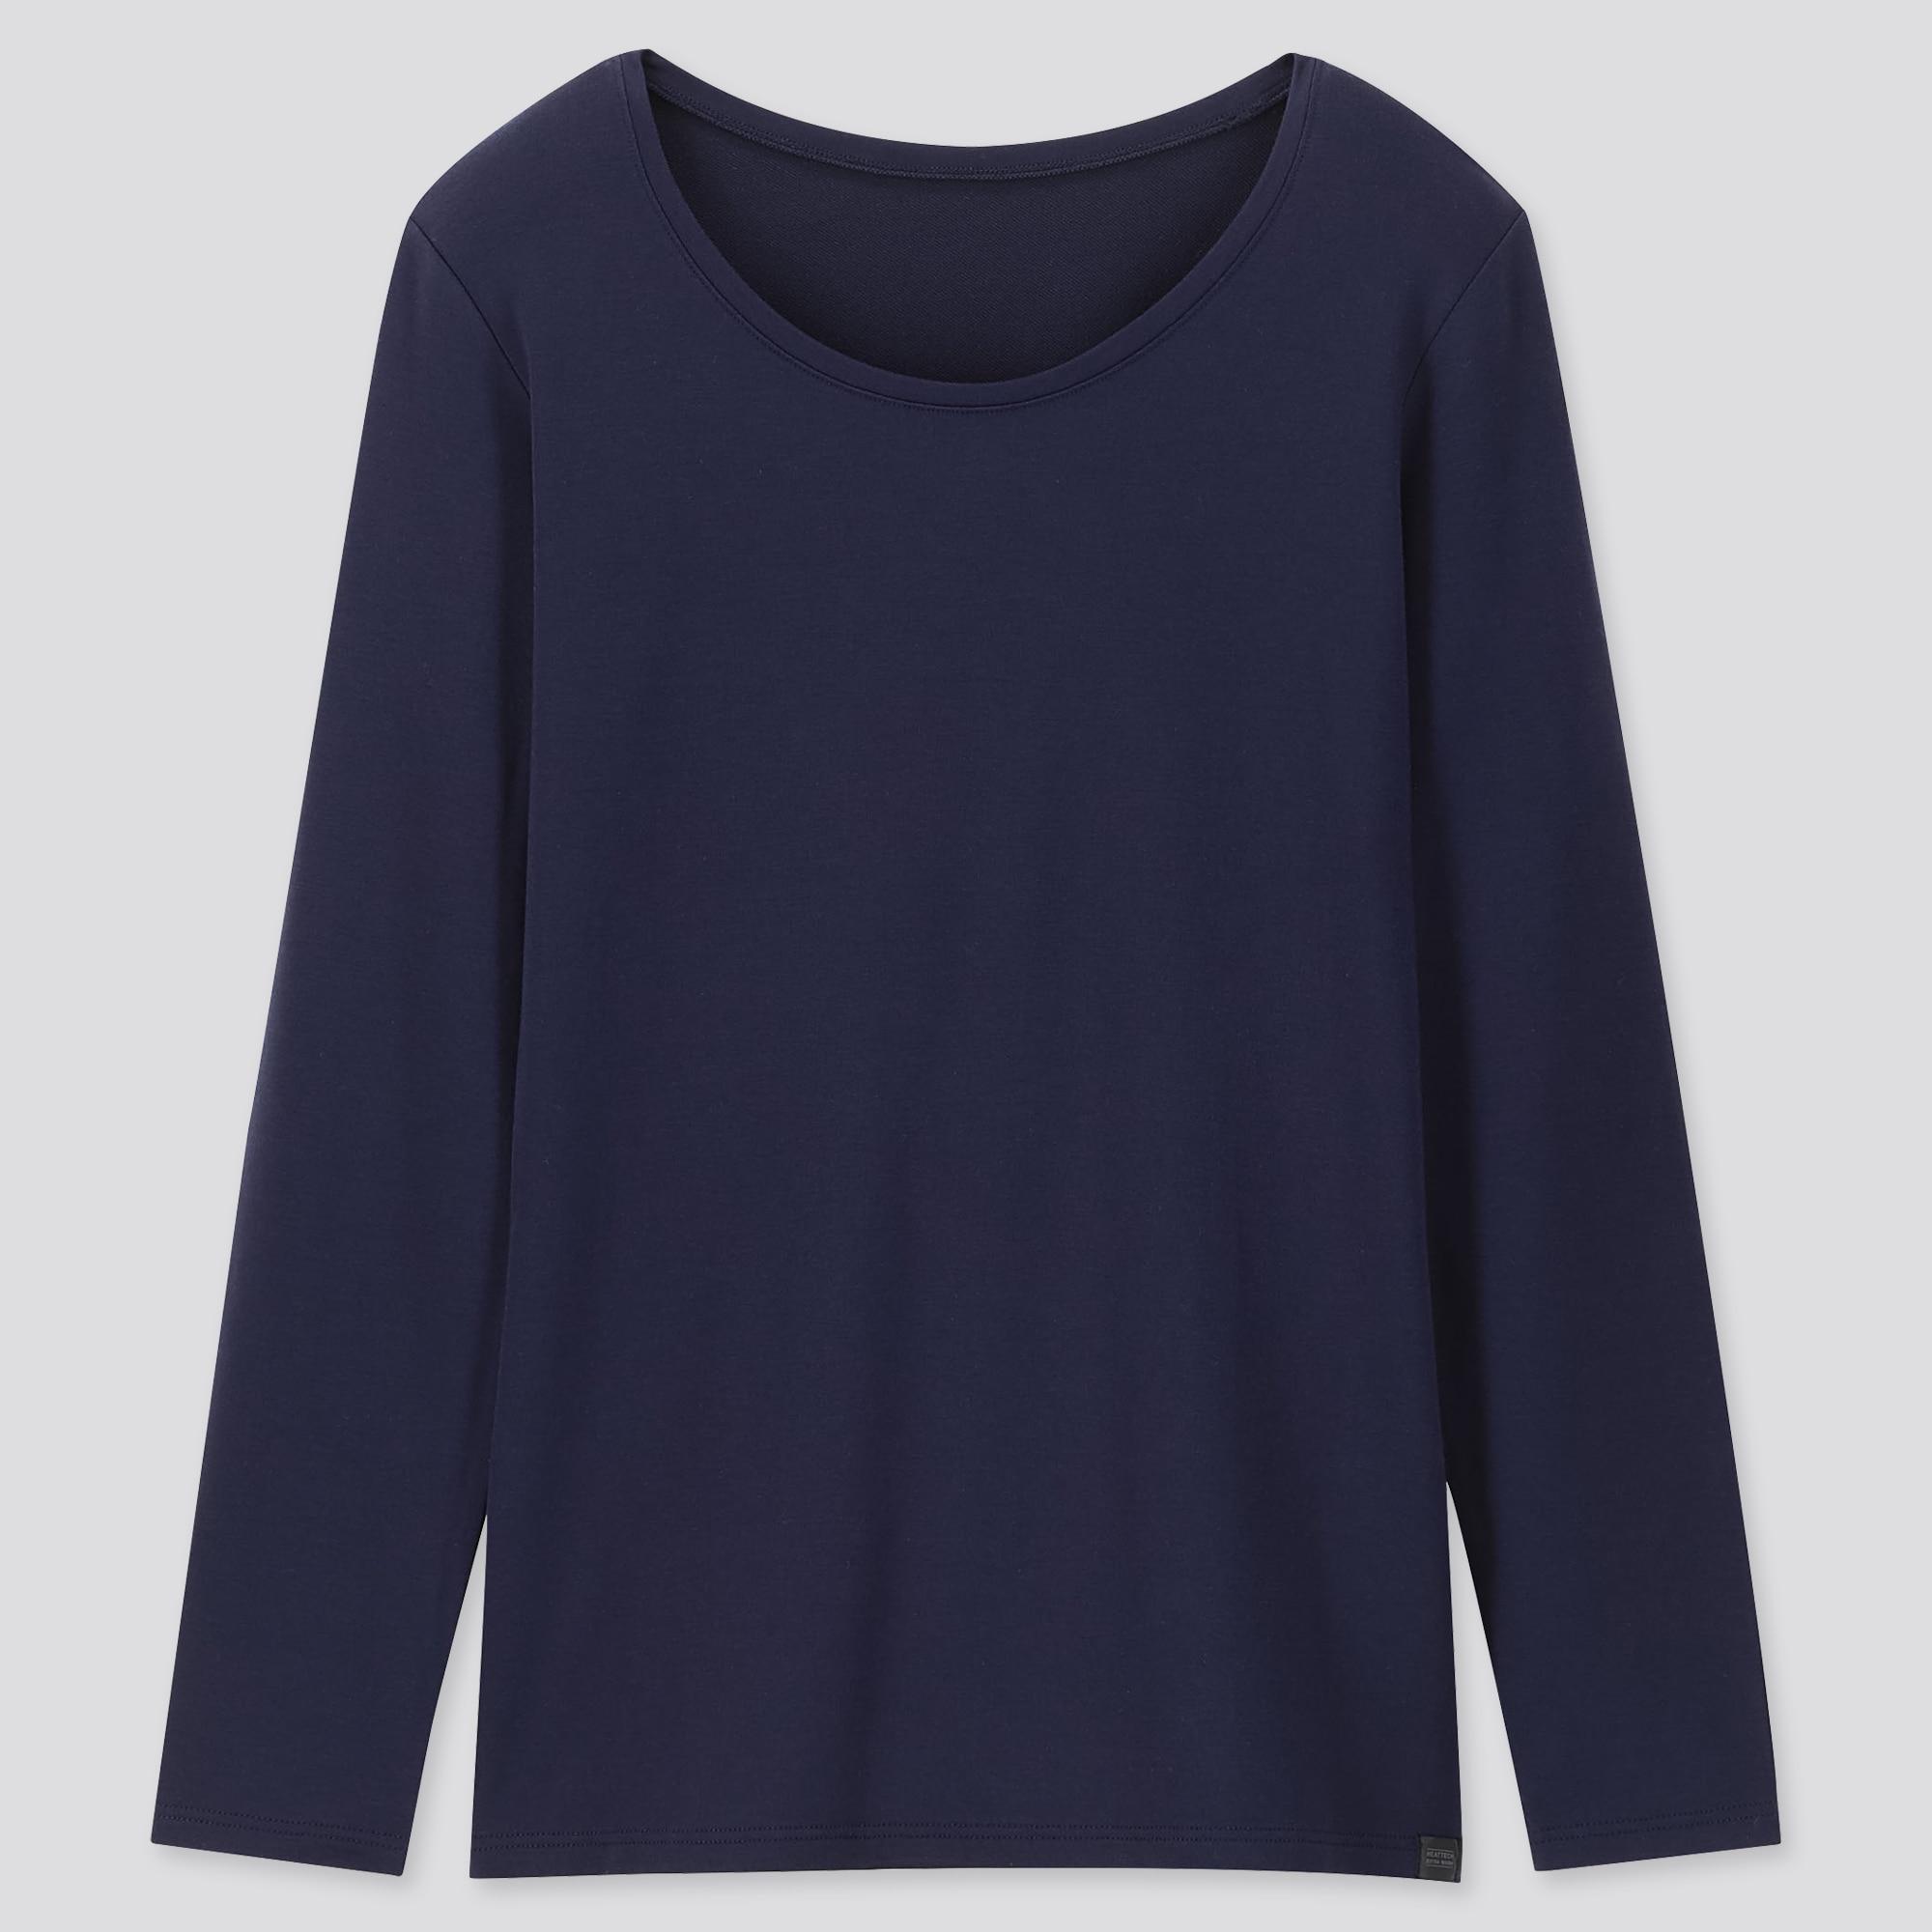 Uniqlo women heattech extra warm crew neck t-shirt